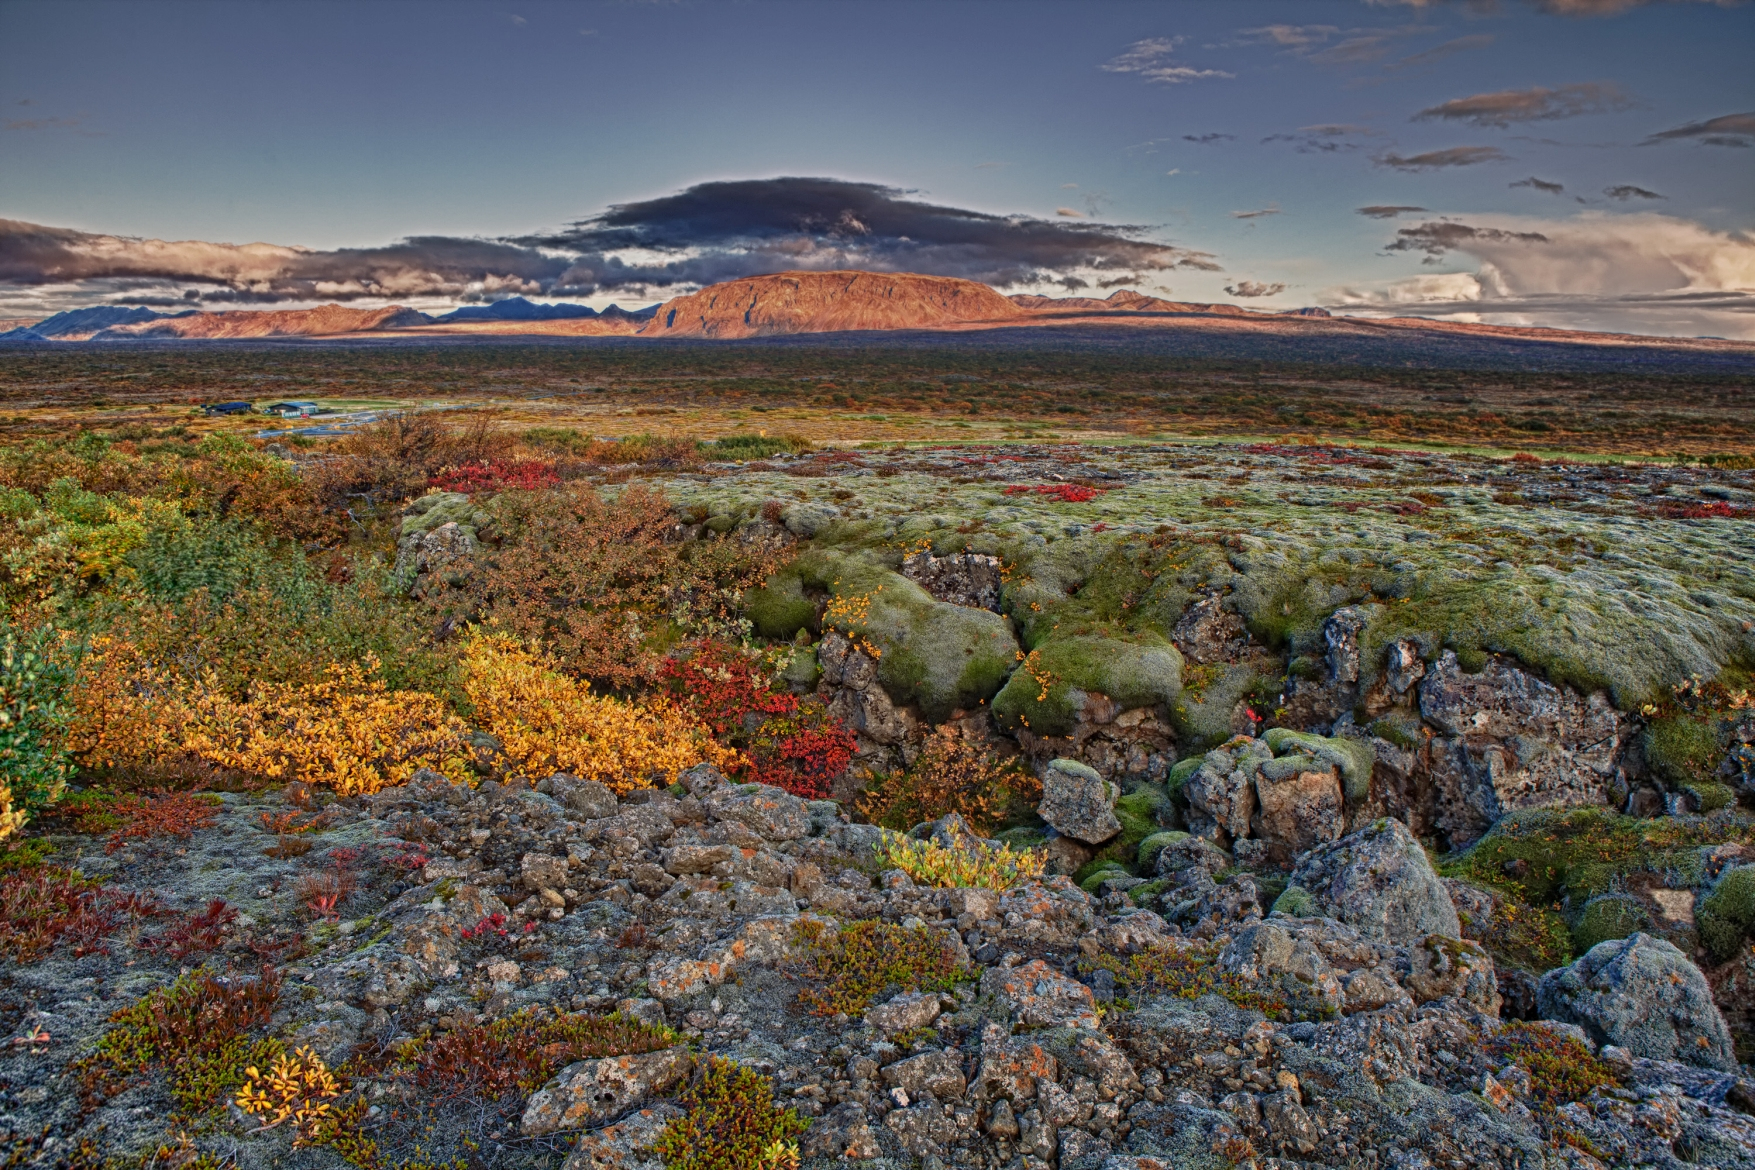 Herbstfarben im September in Island